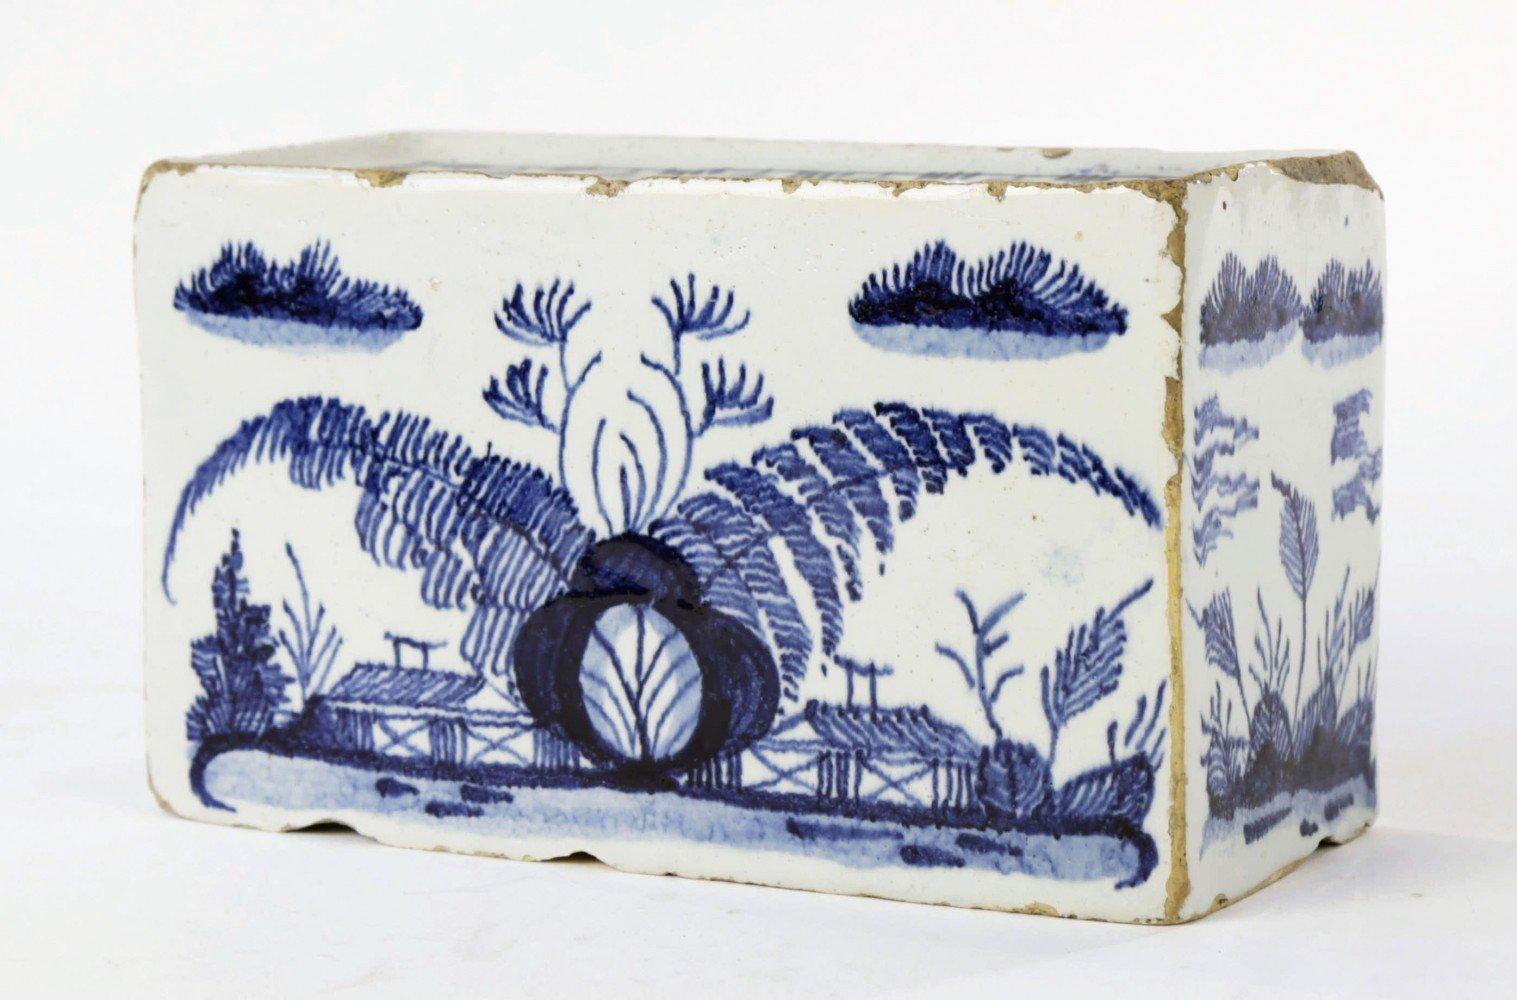 Delft Blue and White Glazed Flower Brick by 18thc. Dutch School